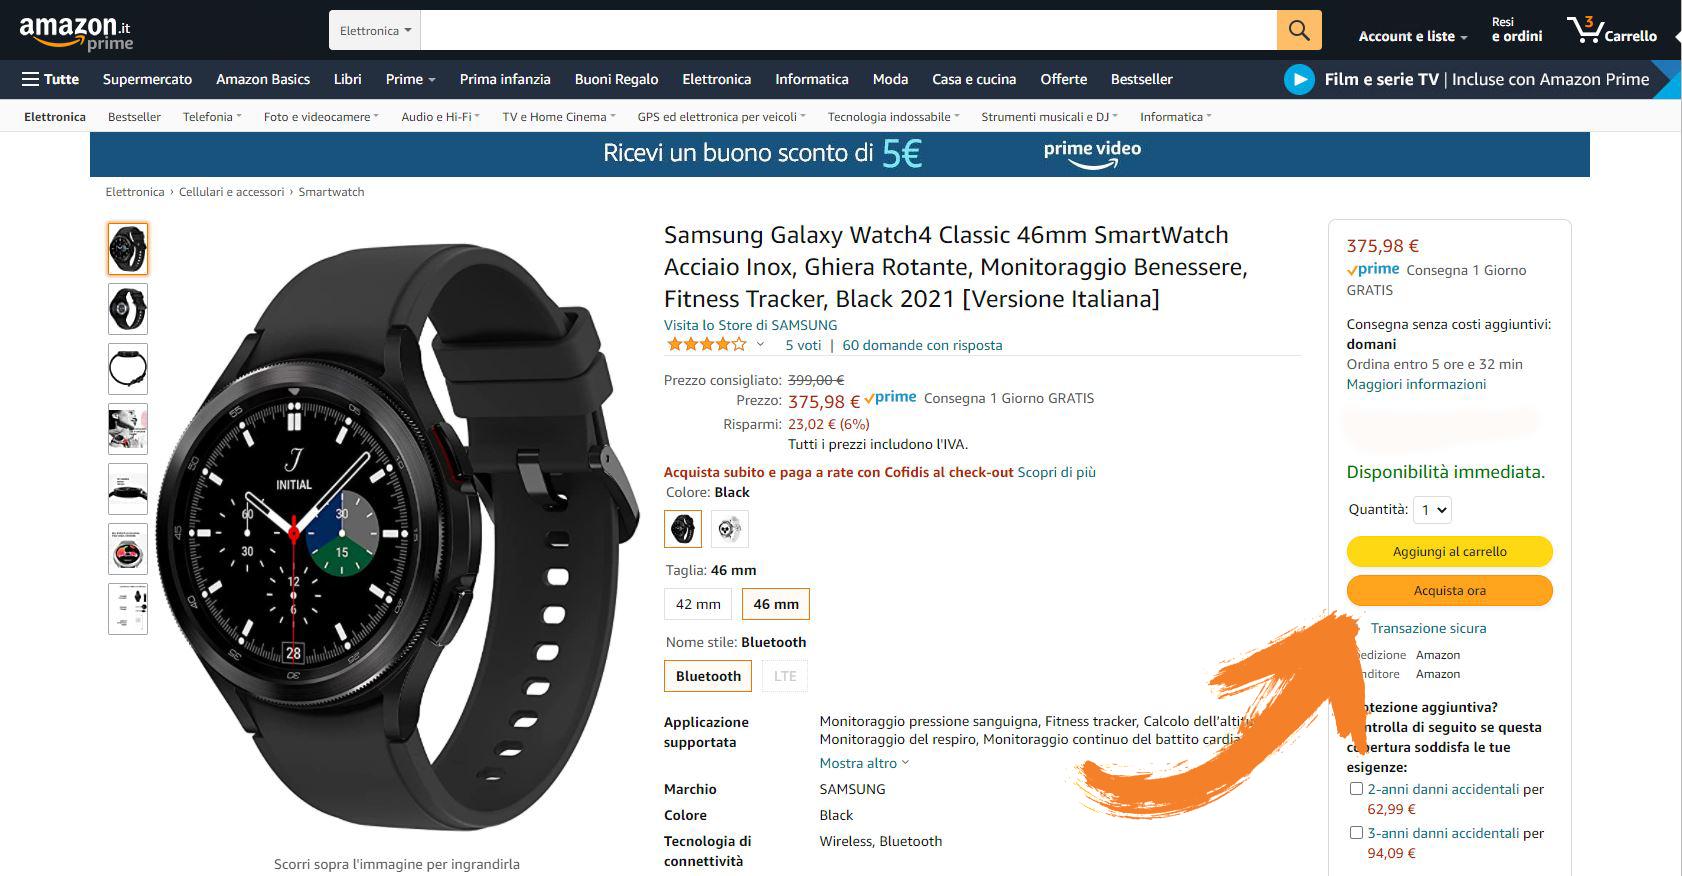 1 come applicare codice sconto su amazon, samsung galaxy watch4